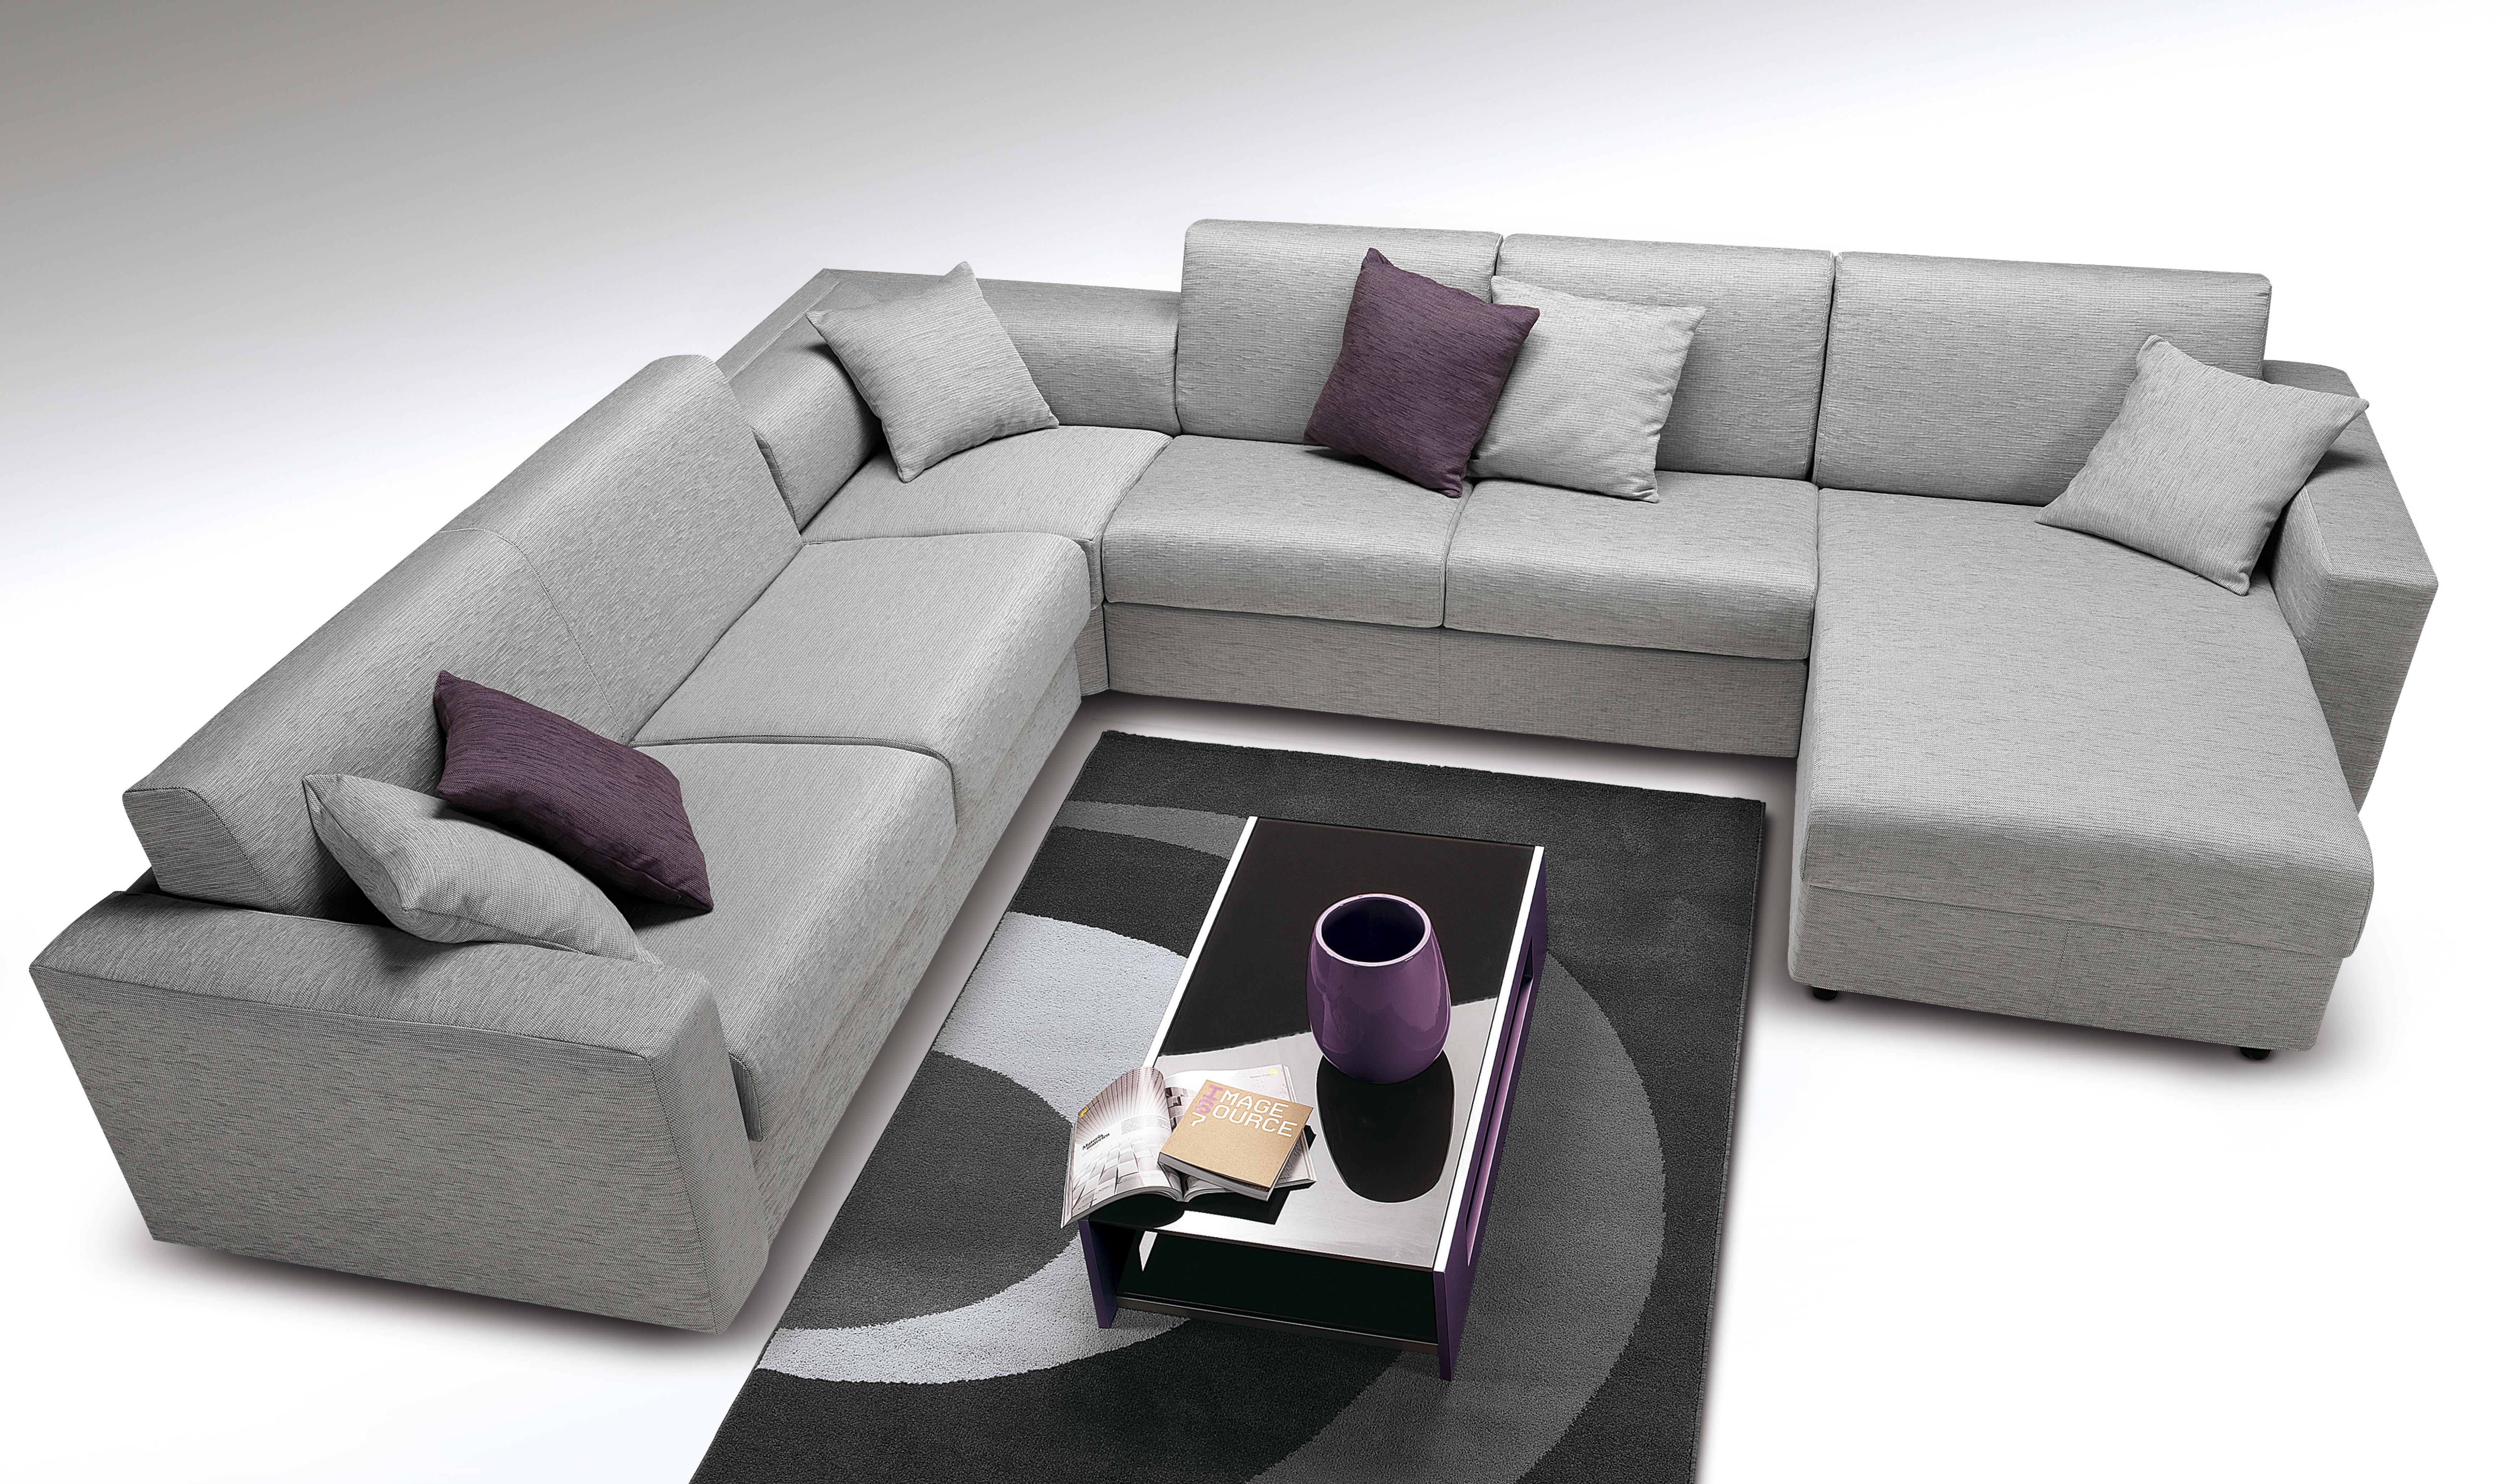 photos canap lit design confortable. Black Bedroom Furniture Sets. Home Design Ideas